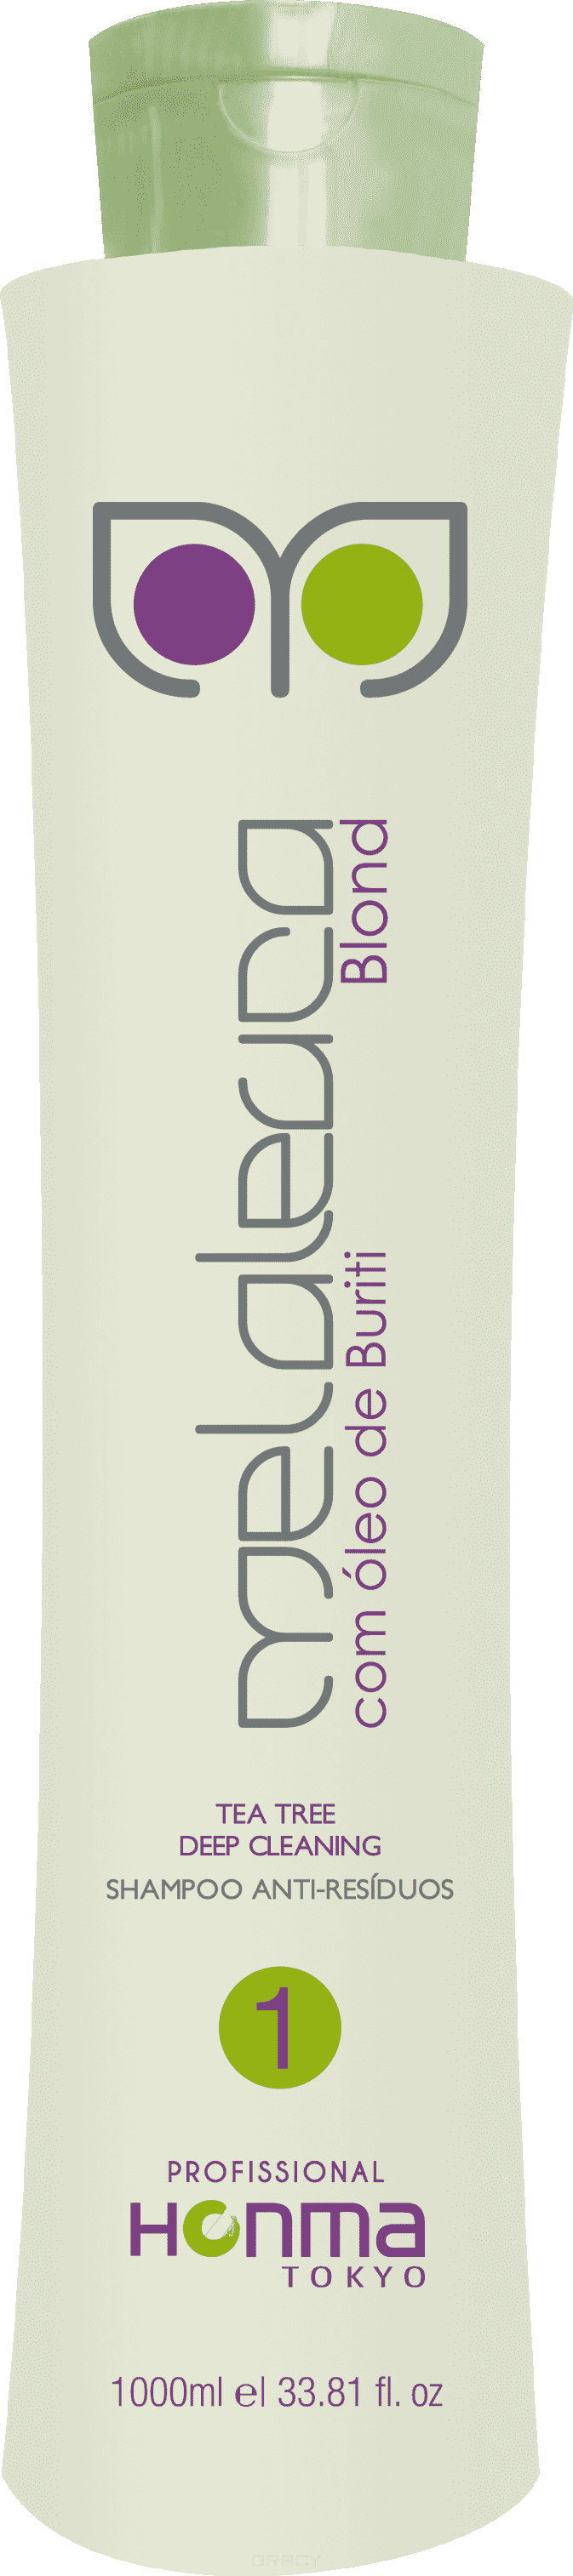 Honma Tokyo Подготавливающий шампунь Escova de Melaleuca Blond Шаг 1 honma tokyo шампунь глубокой очистки линии n solutions 1000 мл